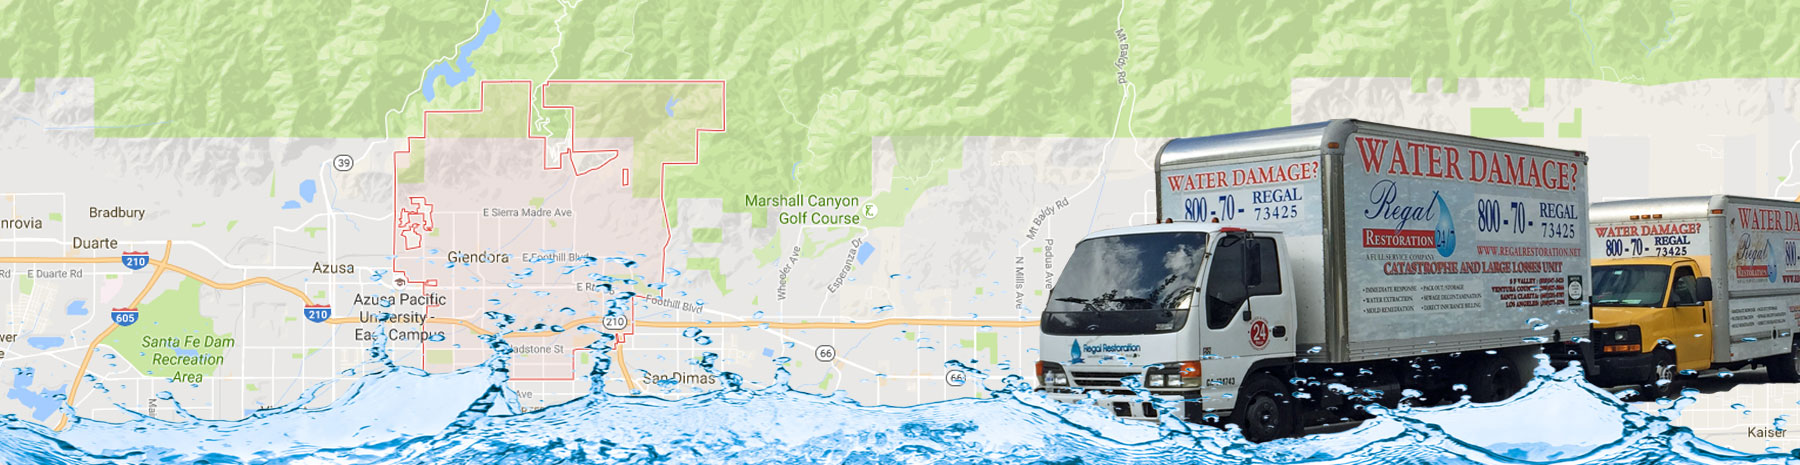 Water Damage Glendora, California